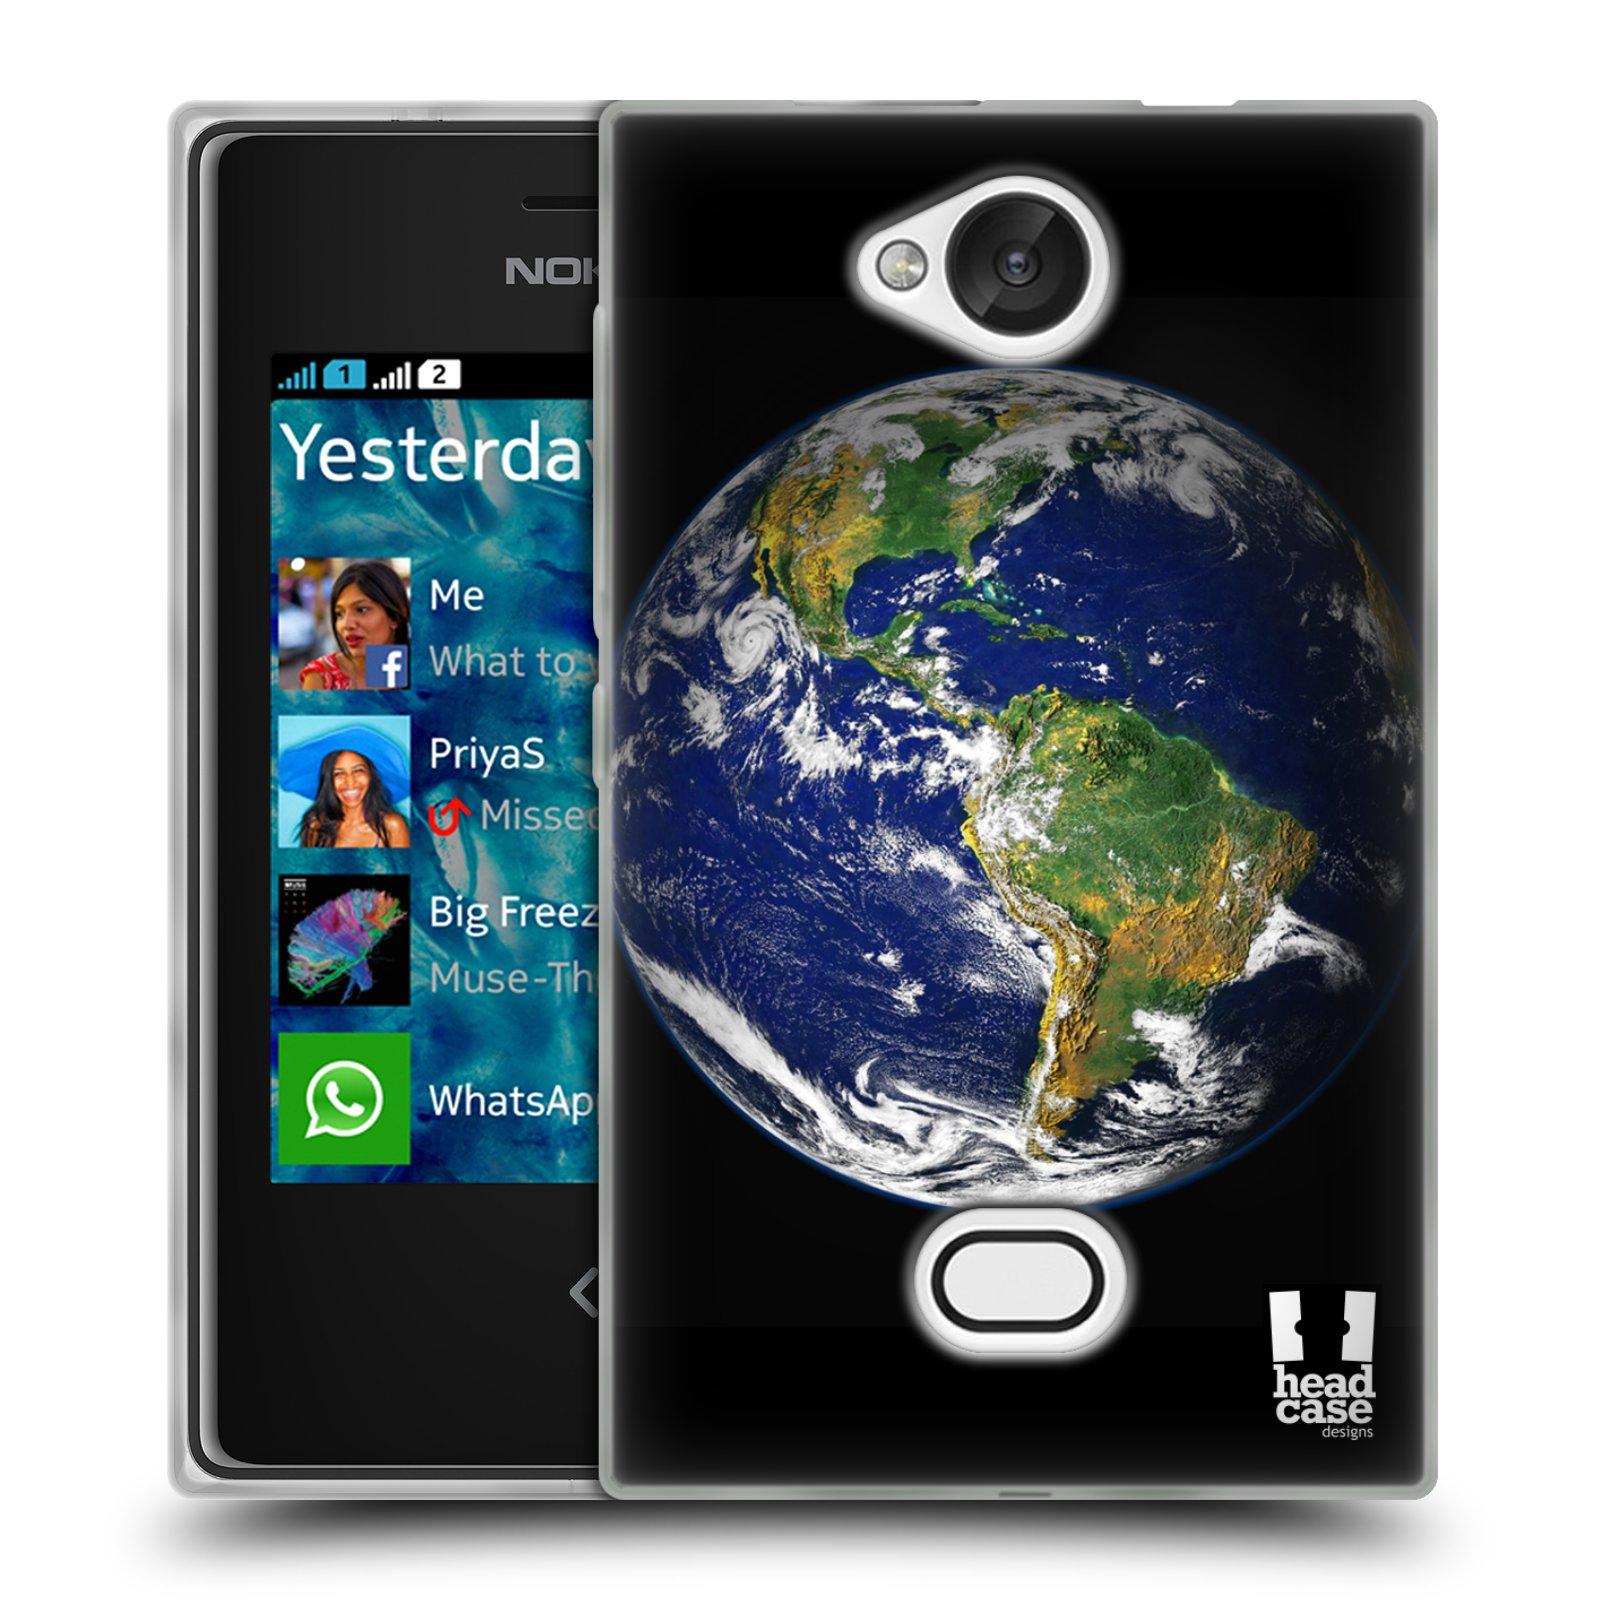 HEAD CASE silikonový obal na mobil NOKIA Asha 503 vzor Vesmírná krása ZEMĚ